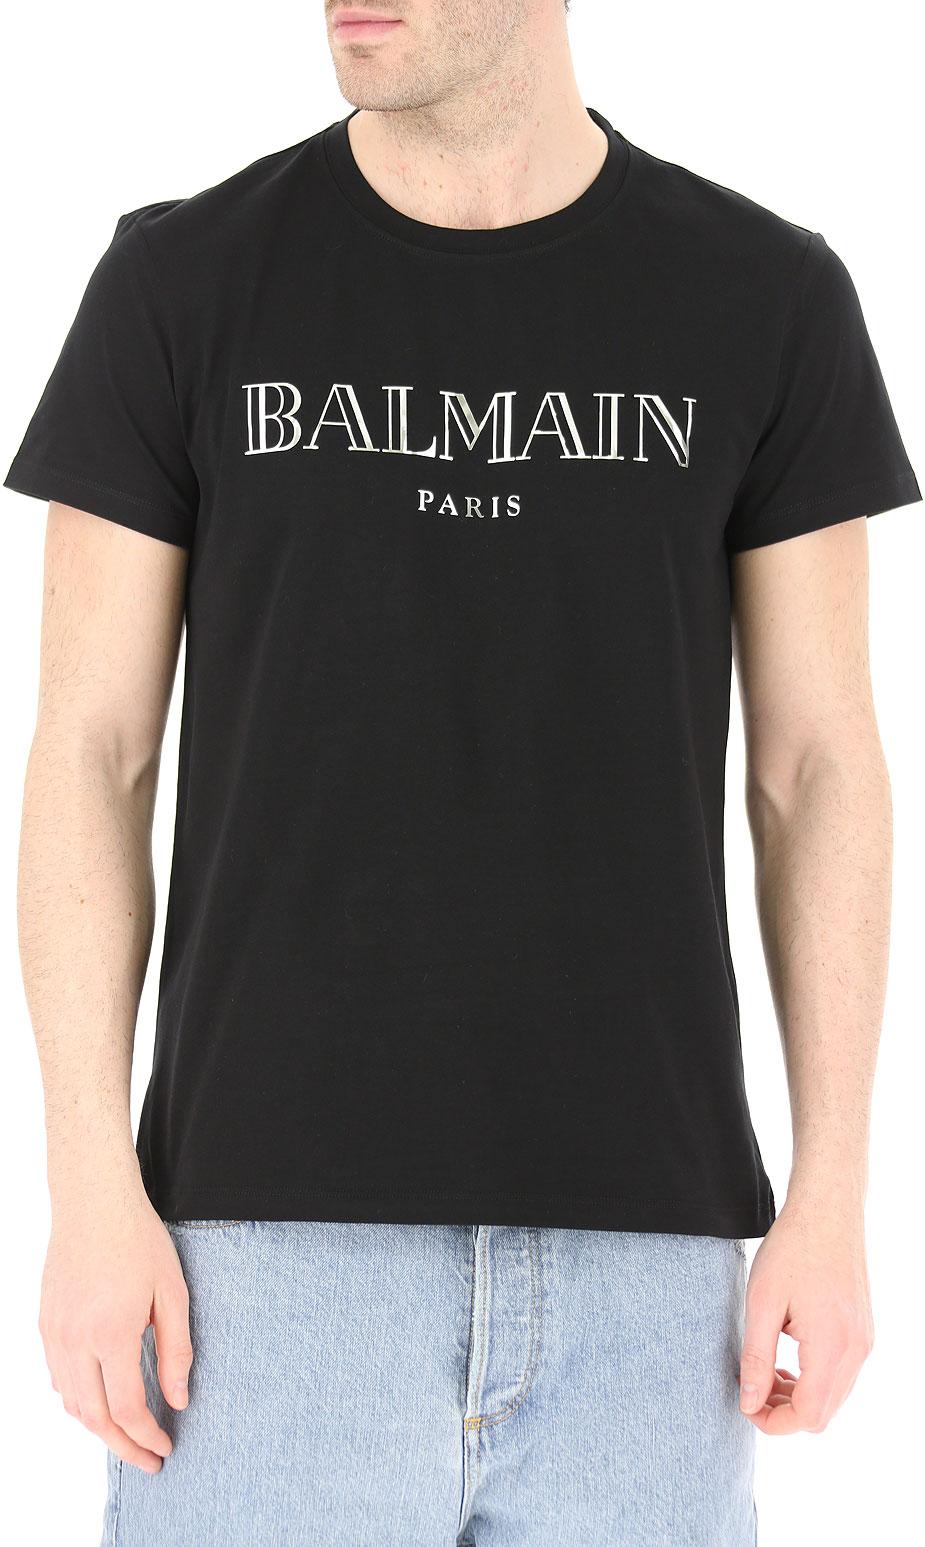 Tee-shirts  Balmain RH11601 BLACK/ARGENT